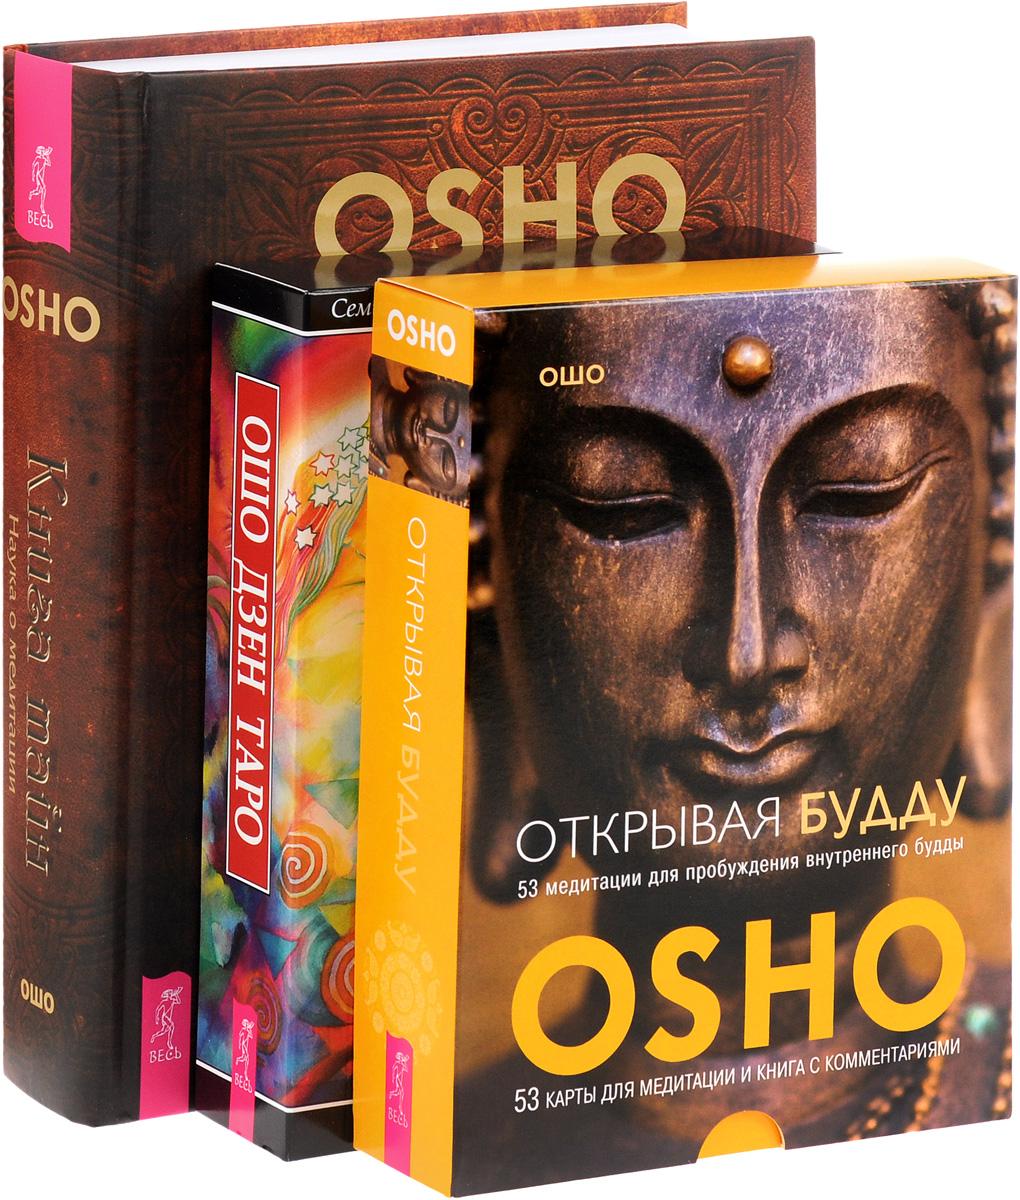 Ошо Открывая Будду. Ошо Дзен Таро. Книга тайн (комплект из 3 книг) ошо нирвана последний кошмар поиск ошо дзен таро комплект из 3 книг 79 карт